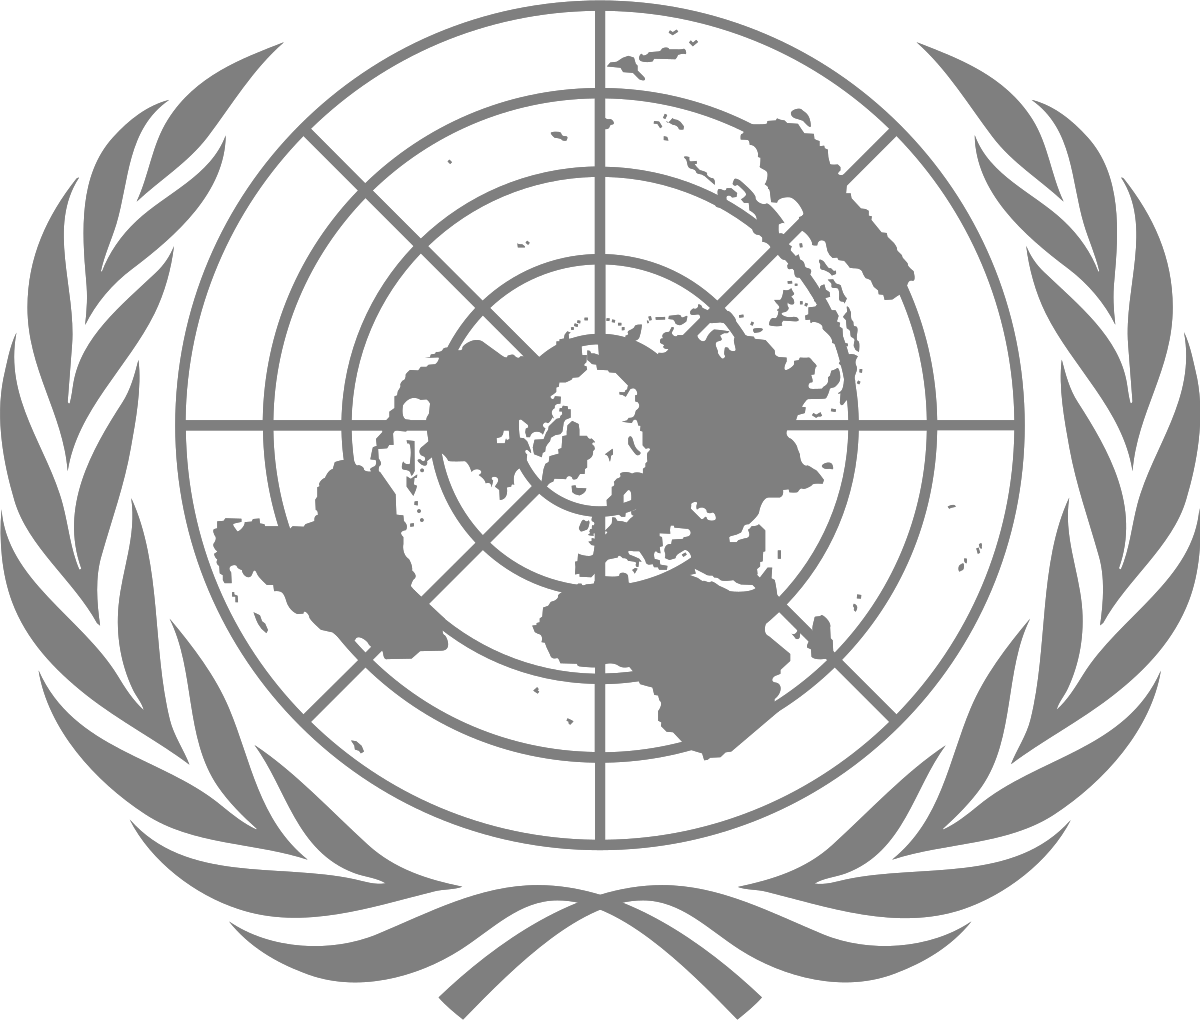 UPPL partner United Nations